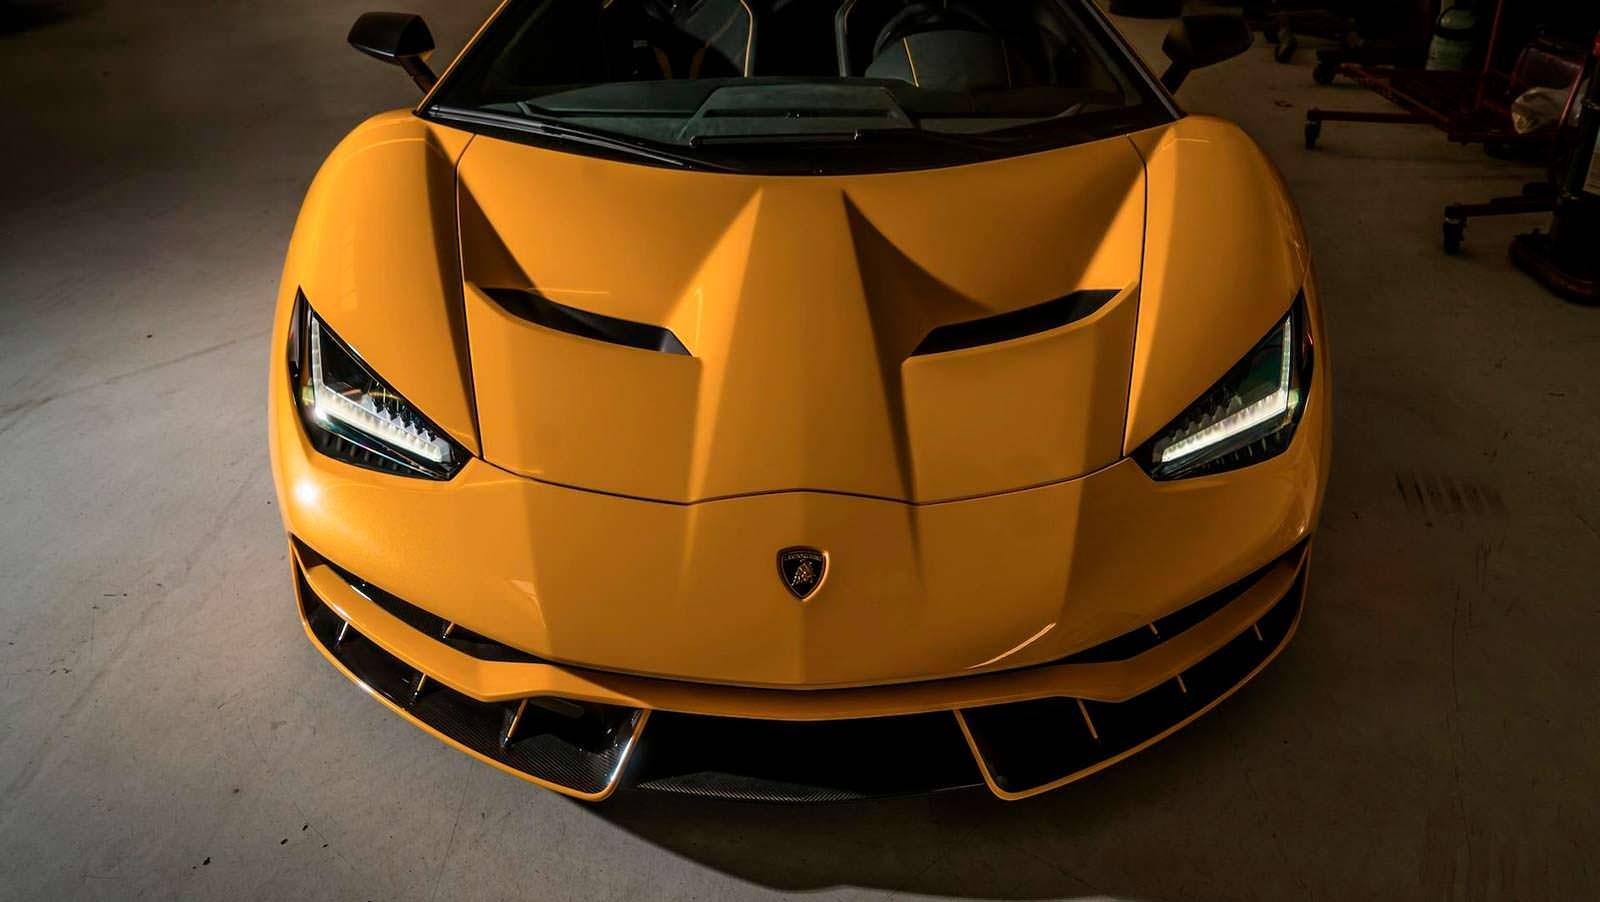 Дизайн передней части Lamborghini Centenario